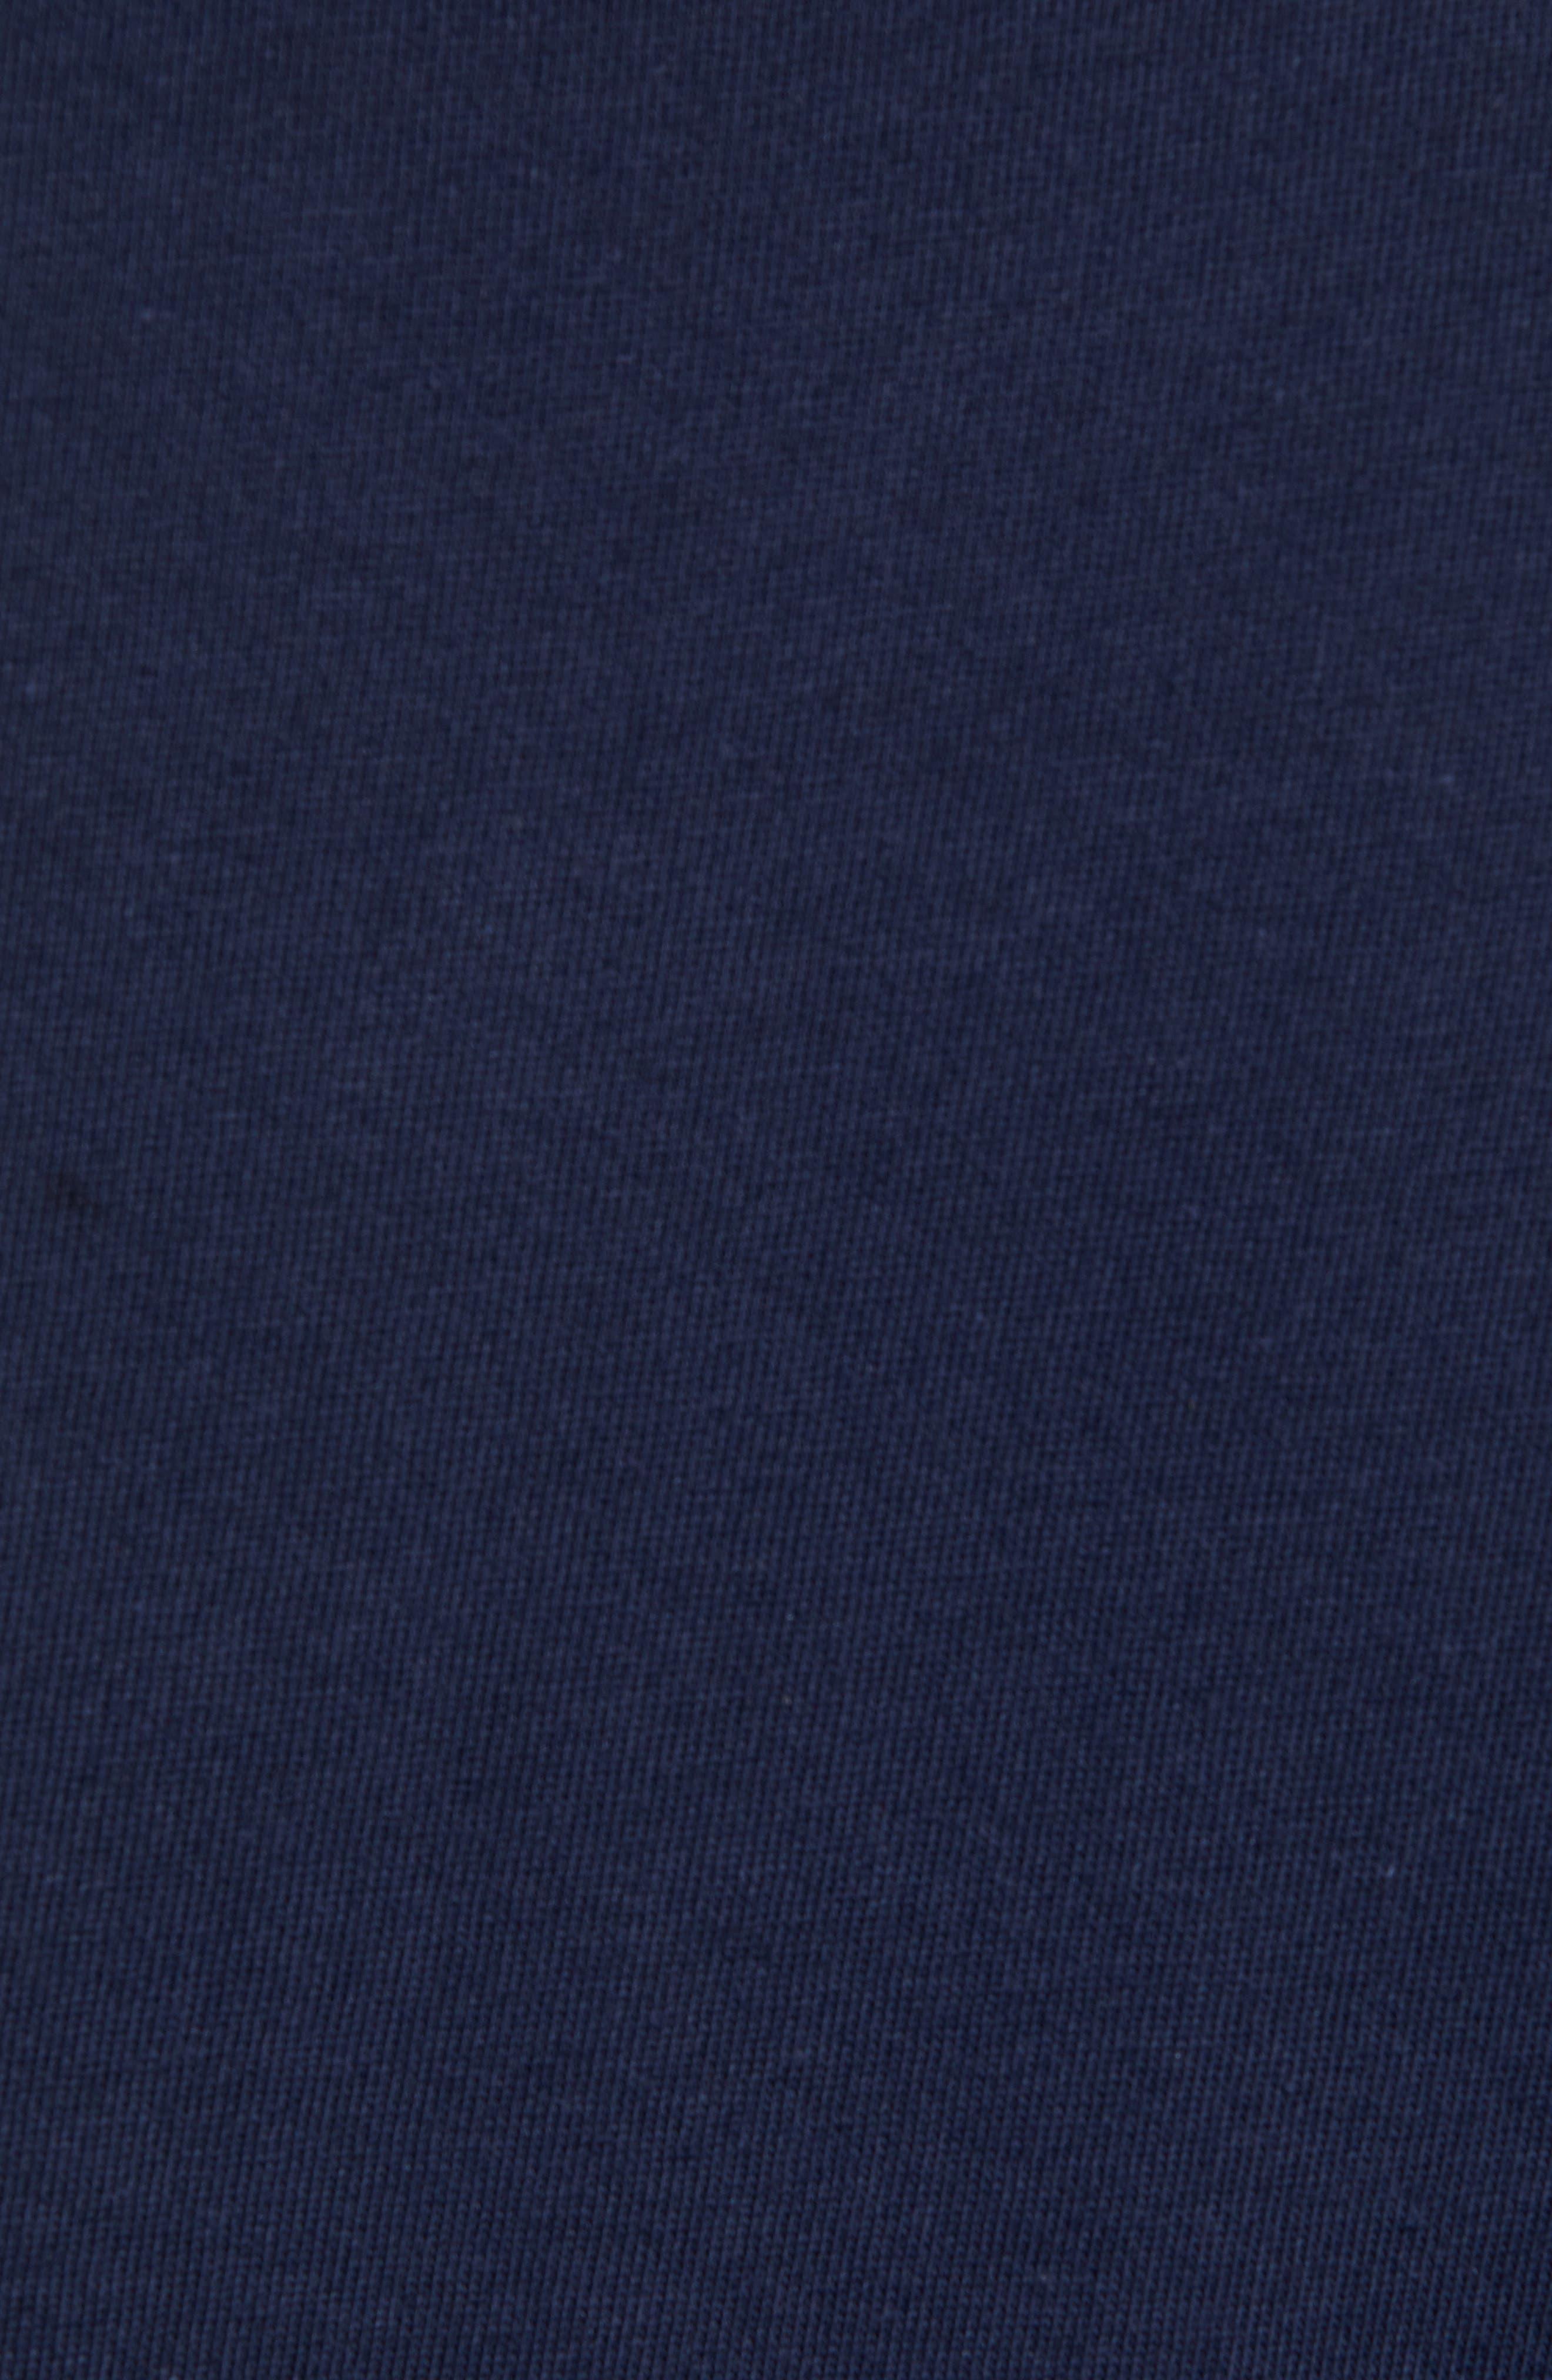 Tech Jersey Regular Fit Tee,                             Alternate thumbnail 5, color,                             NAVY BLUE/ WHITE